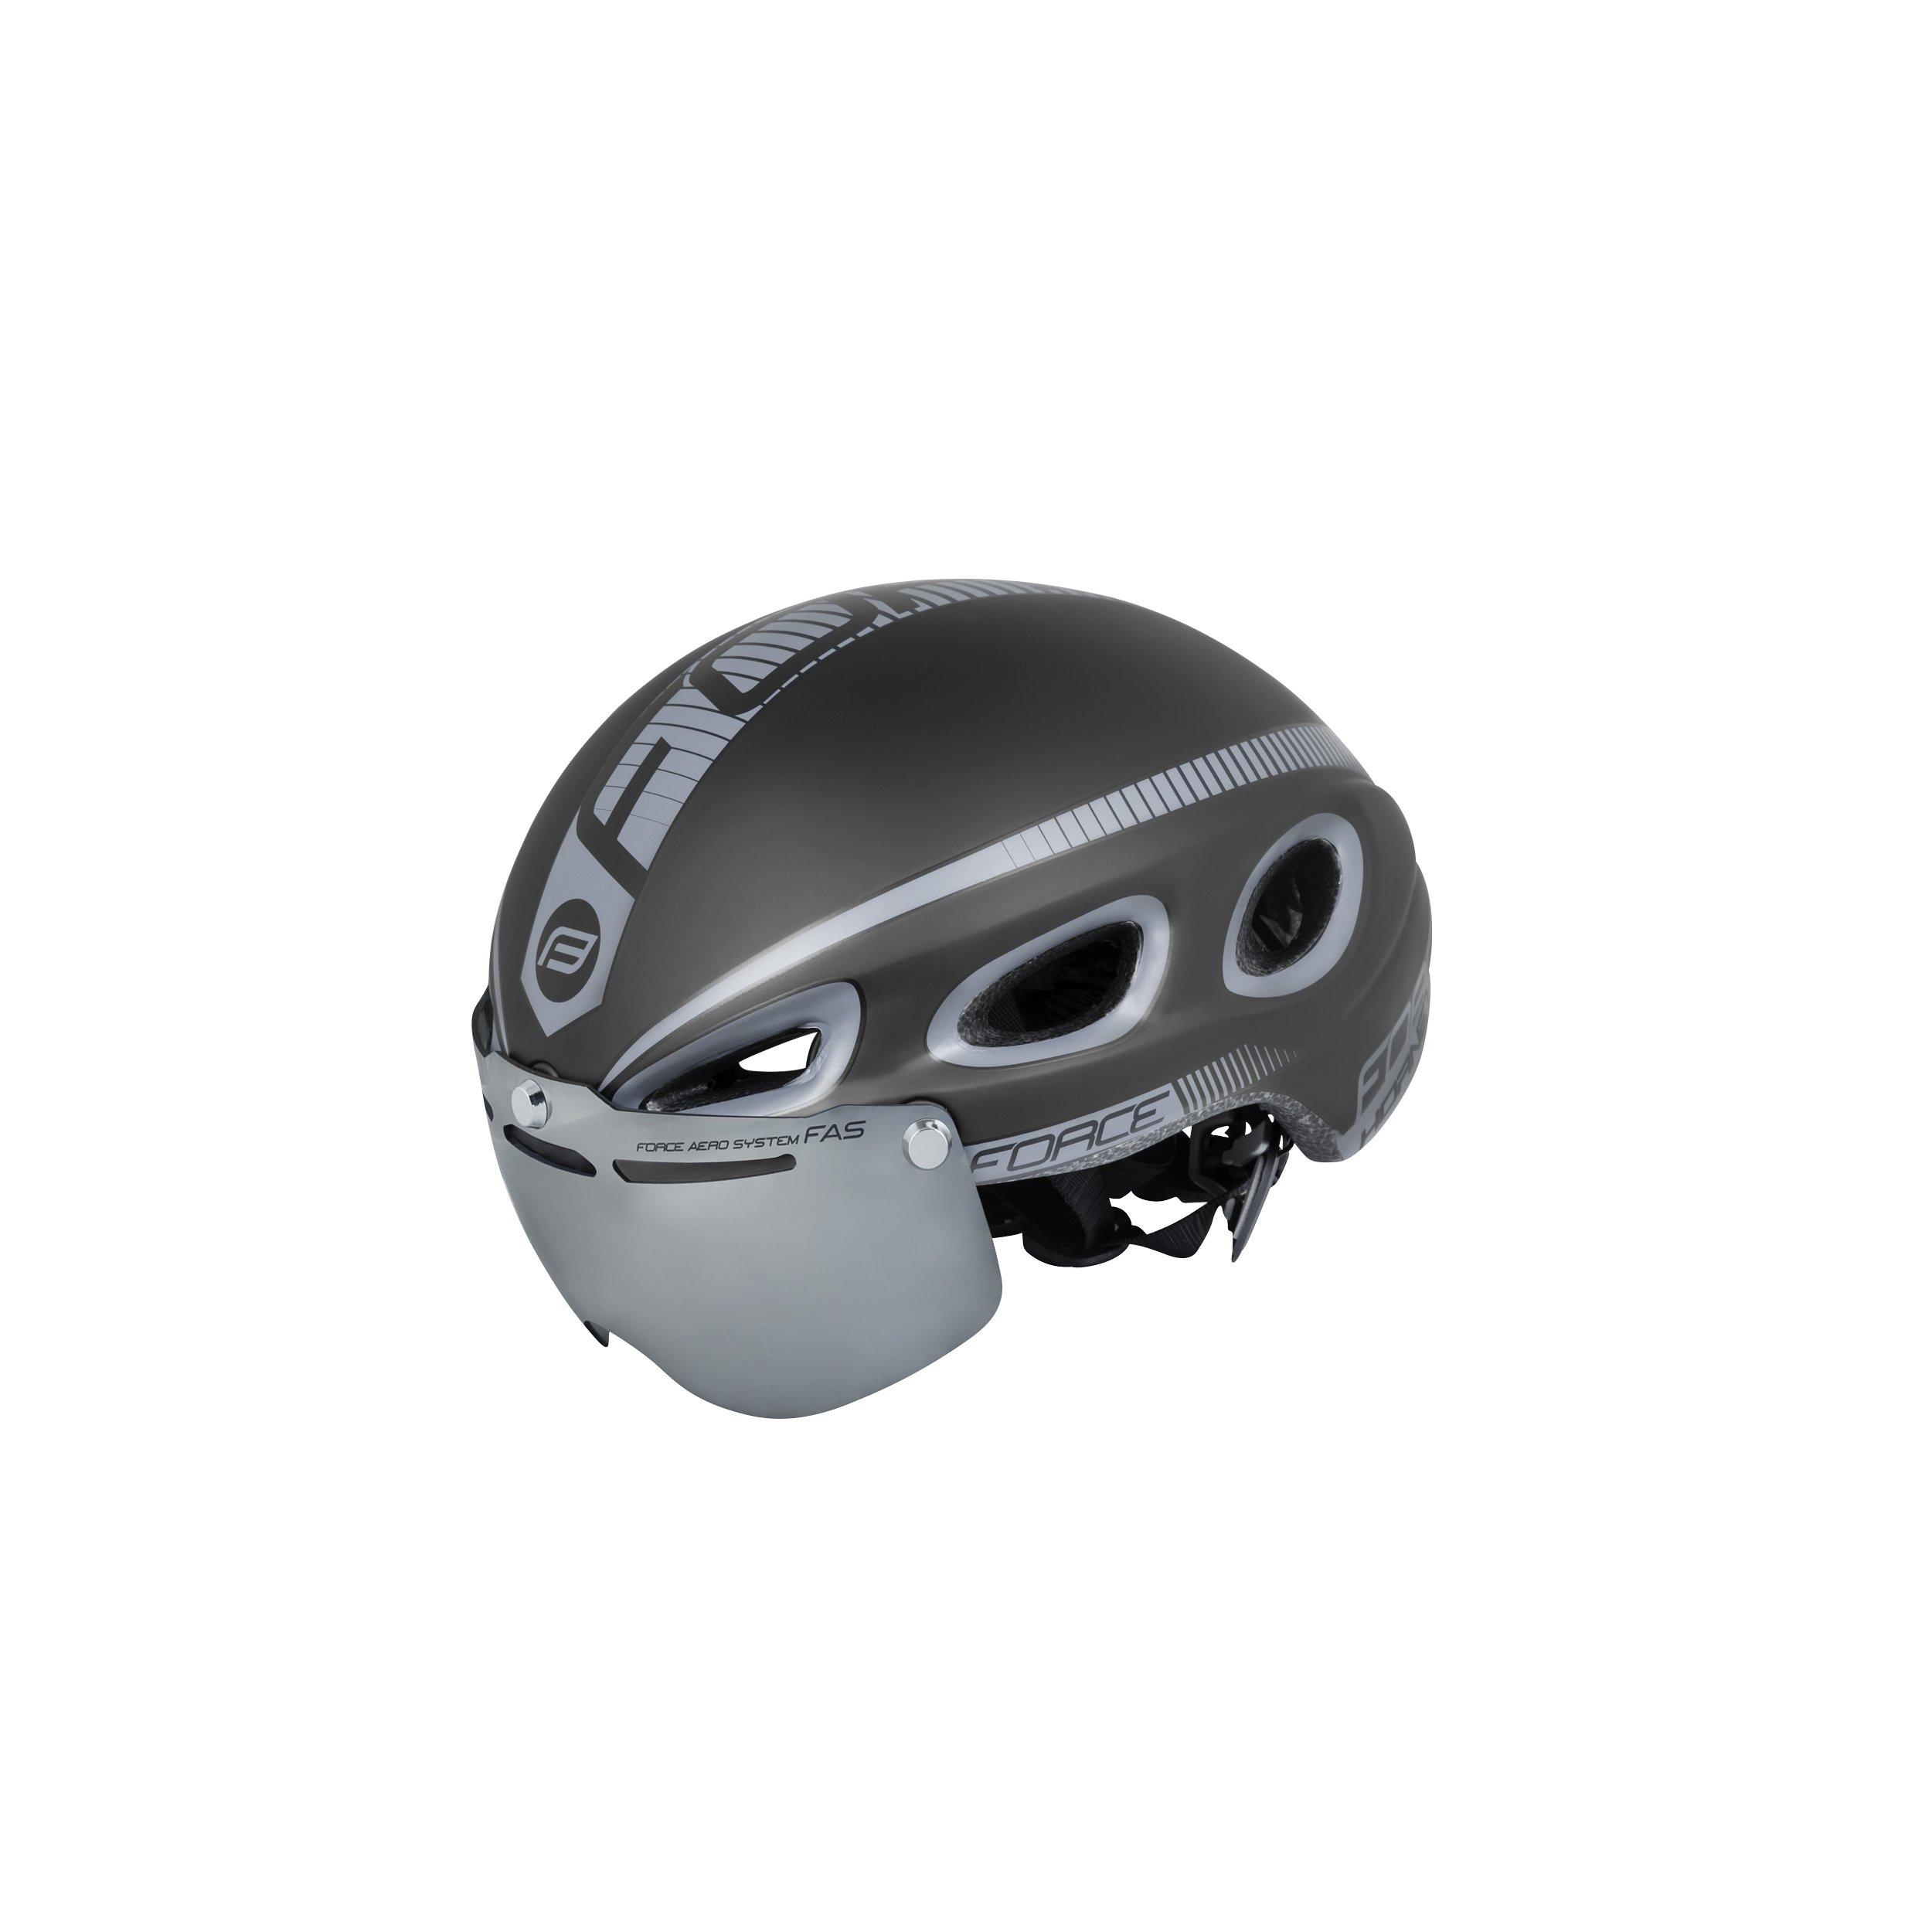 force - Hornet Aerodnamisk Hjelm med Visir